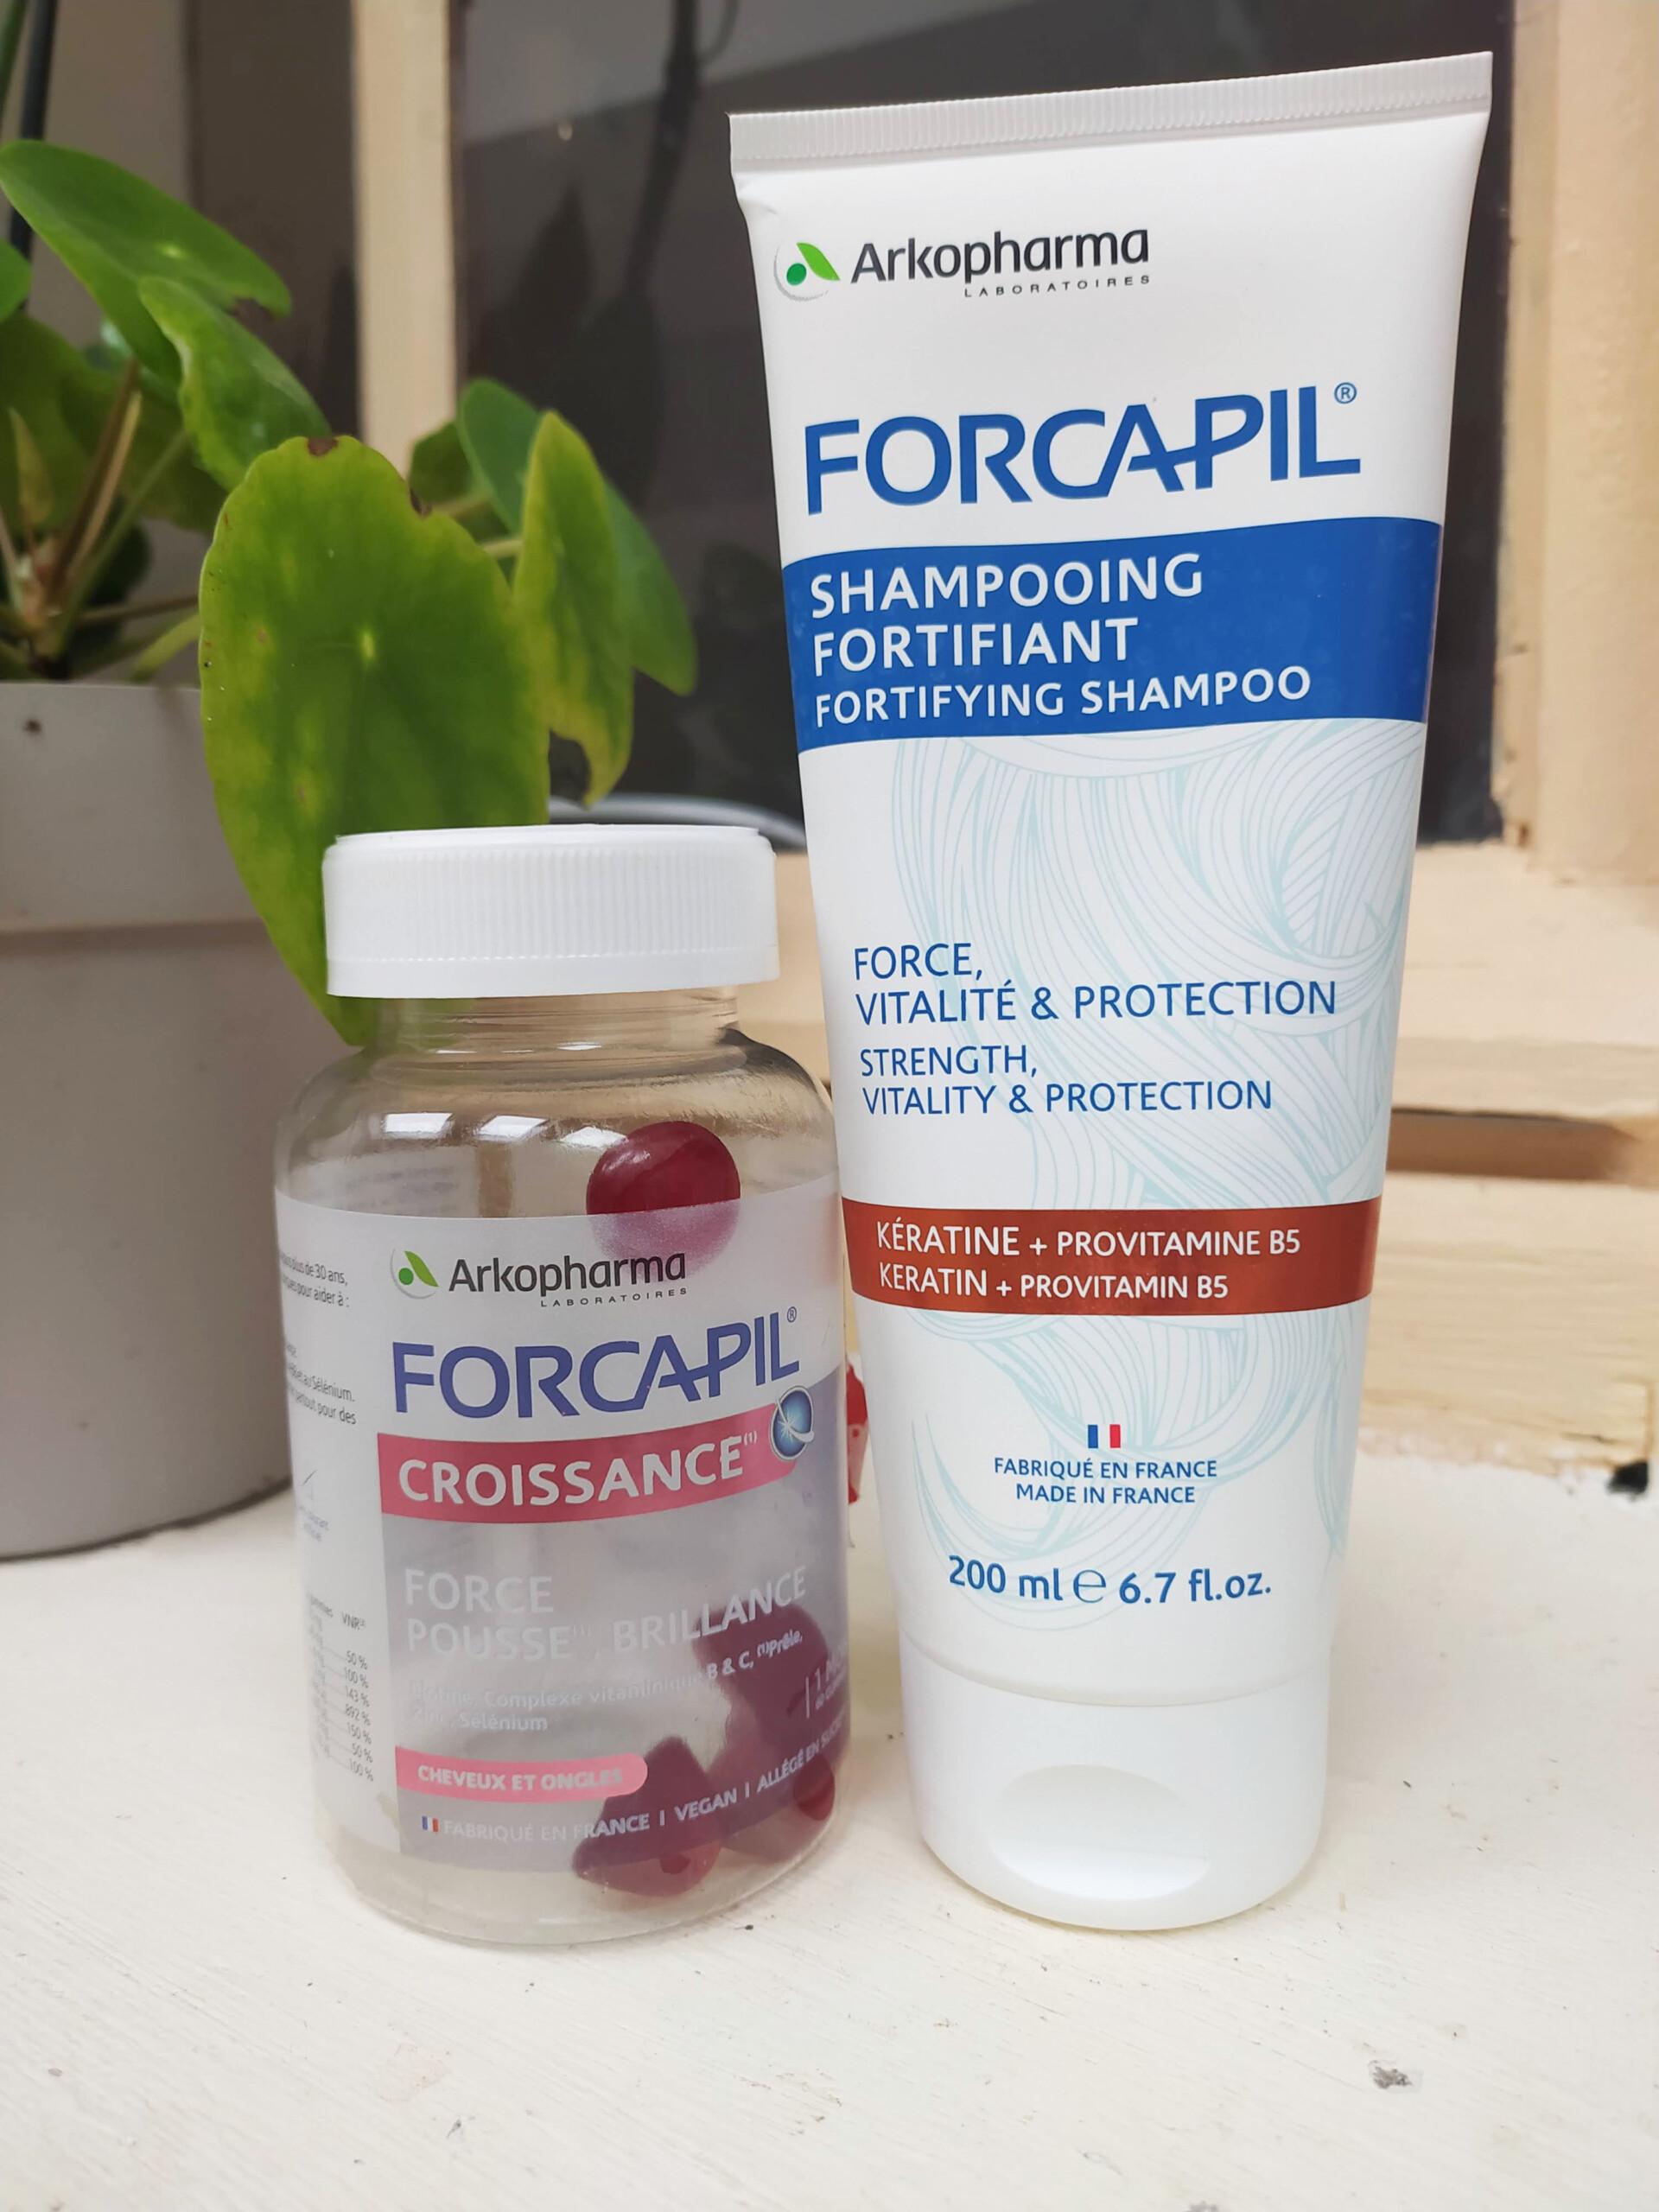 shampoing fortifiant et gummies forcapil